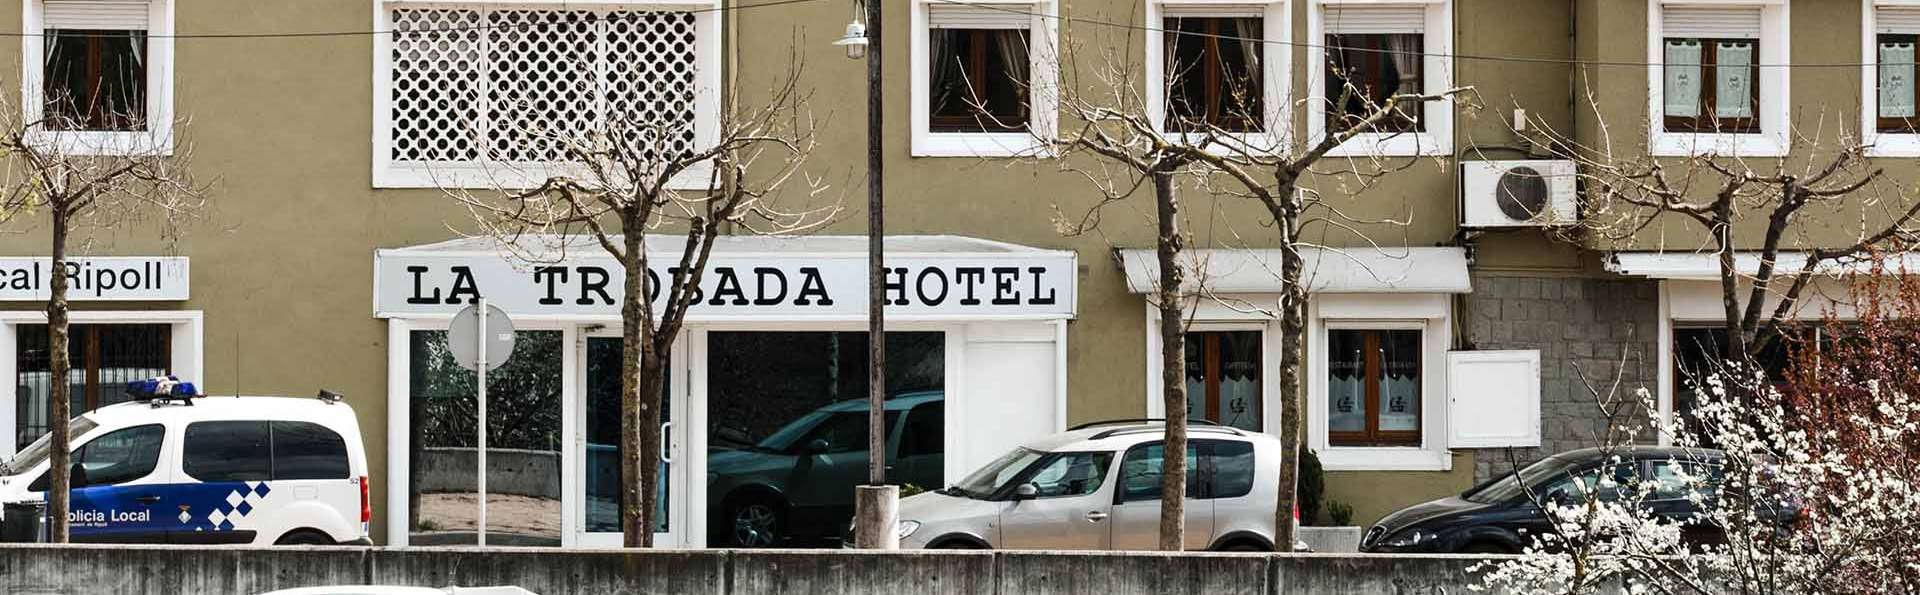 La Trobada Hotel - EDIT_Latrobada_hotel_01.jpg